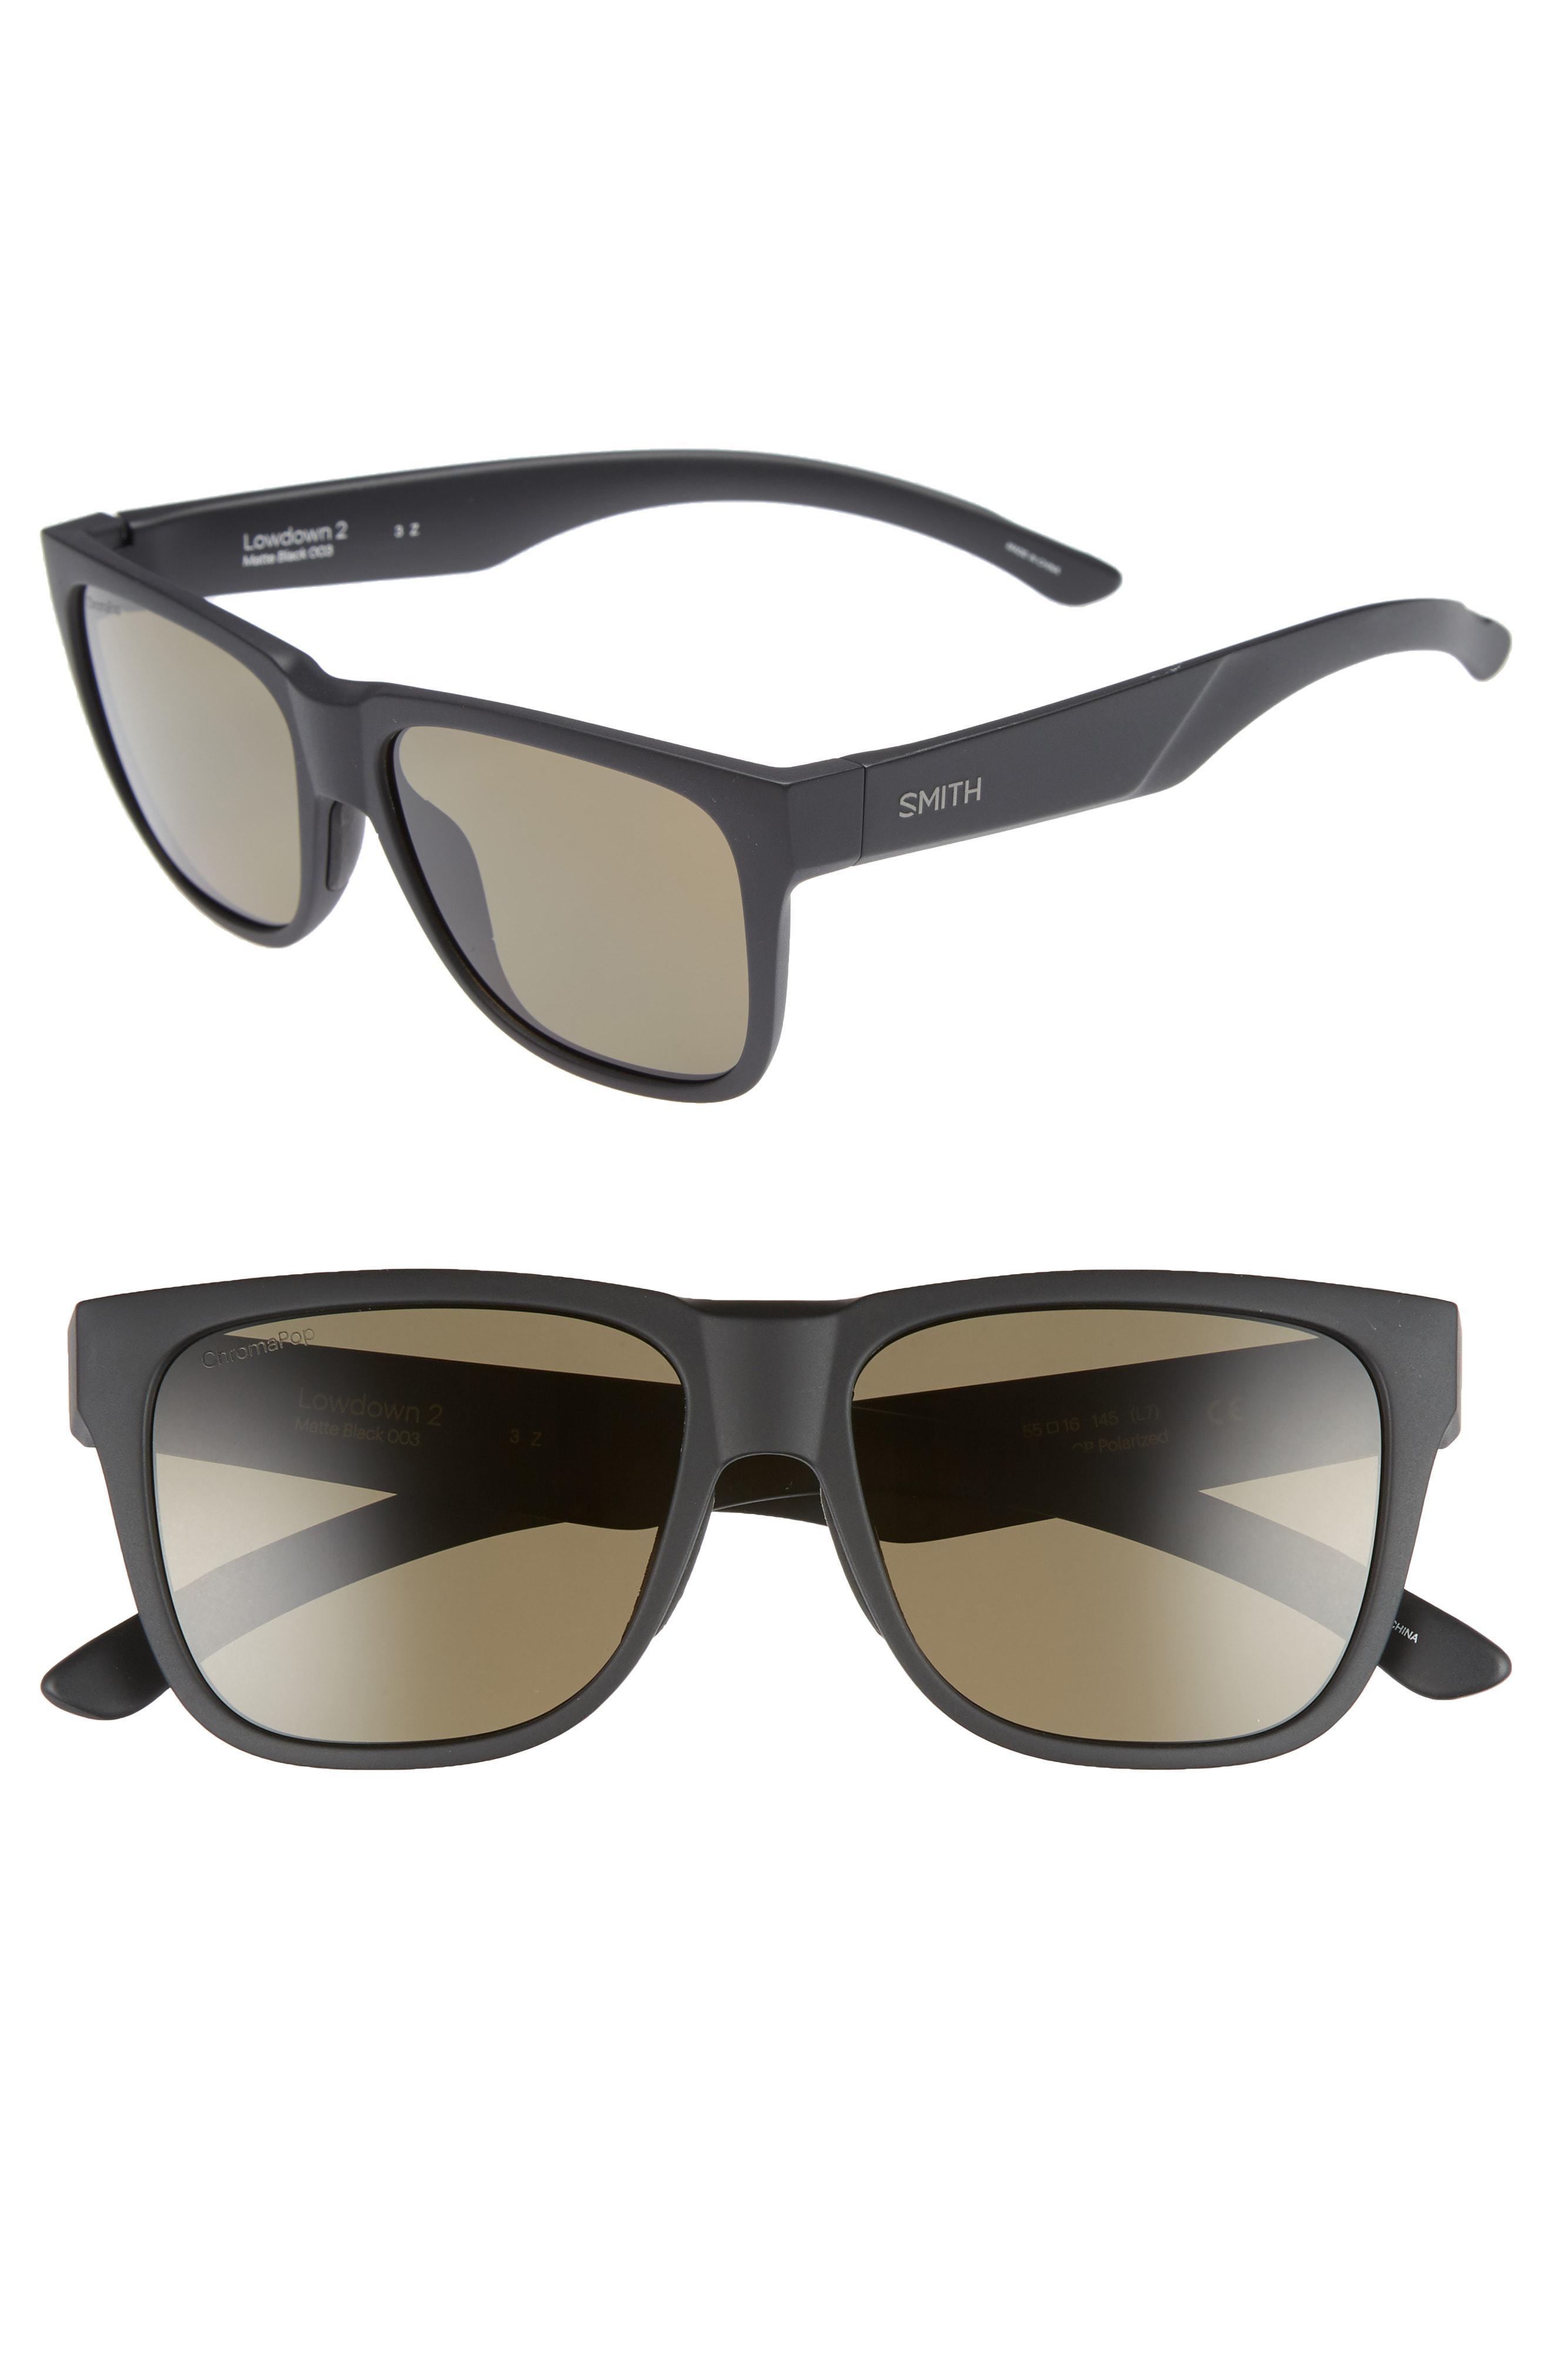 79199e2eb36 Smith - Serpico 2 65mm Mirrored Chromapop(tm) Polarized Aviator Sunglasses  - Lyst. View fullscreen